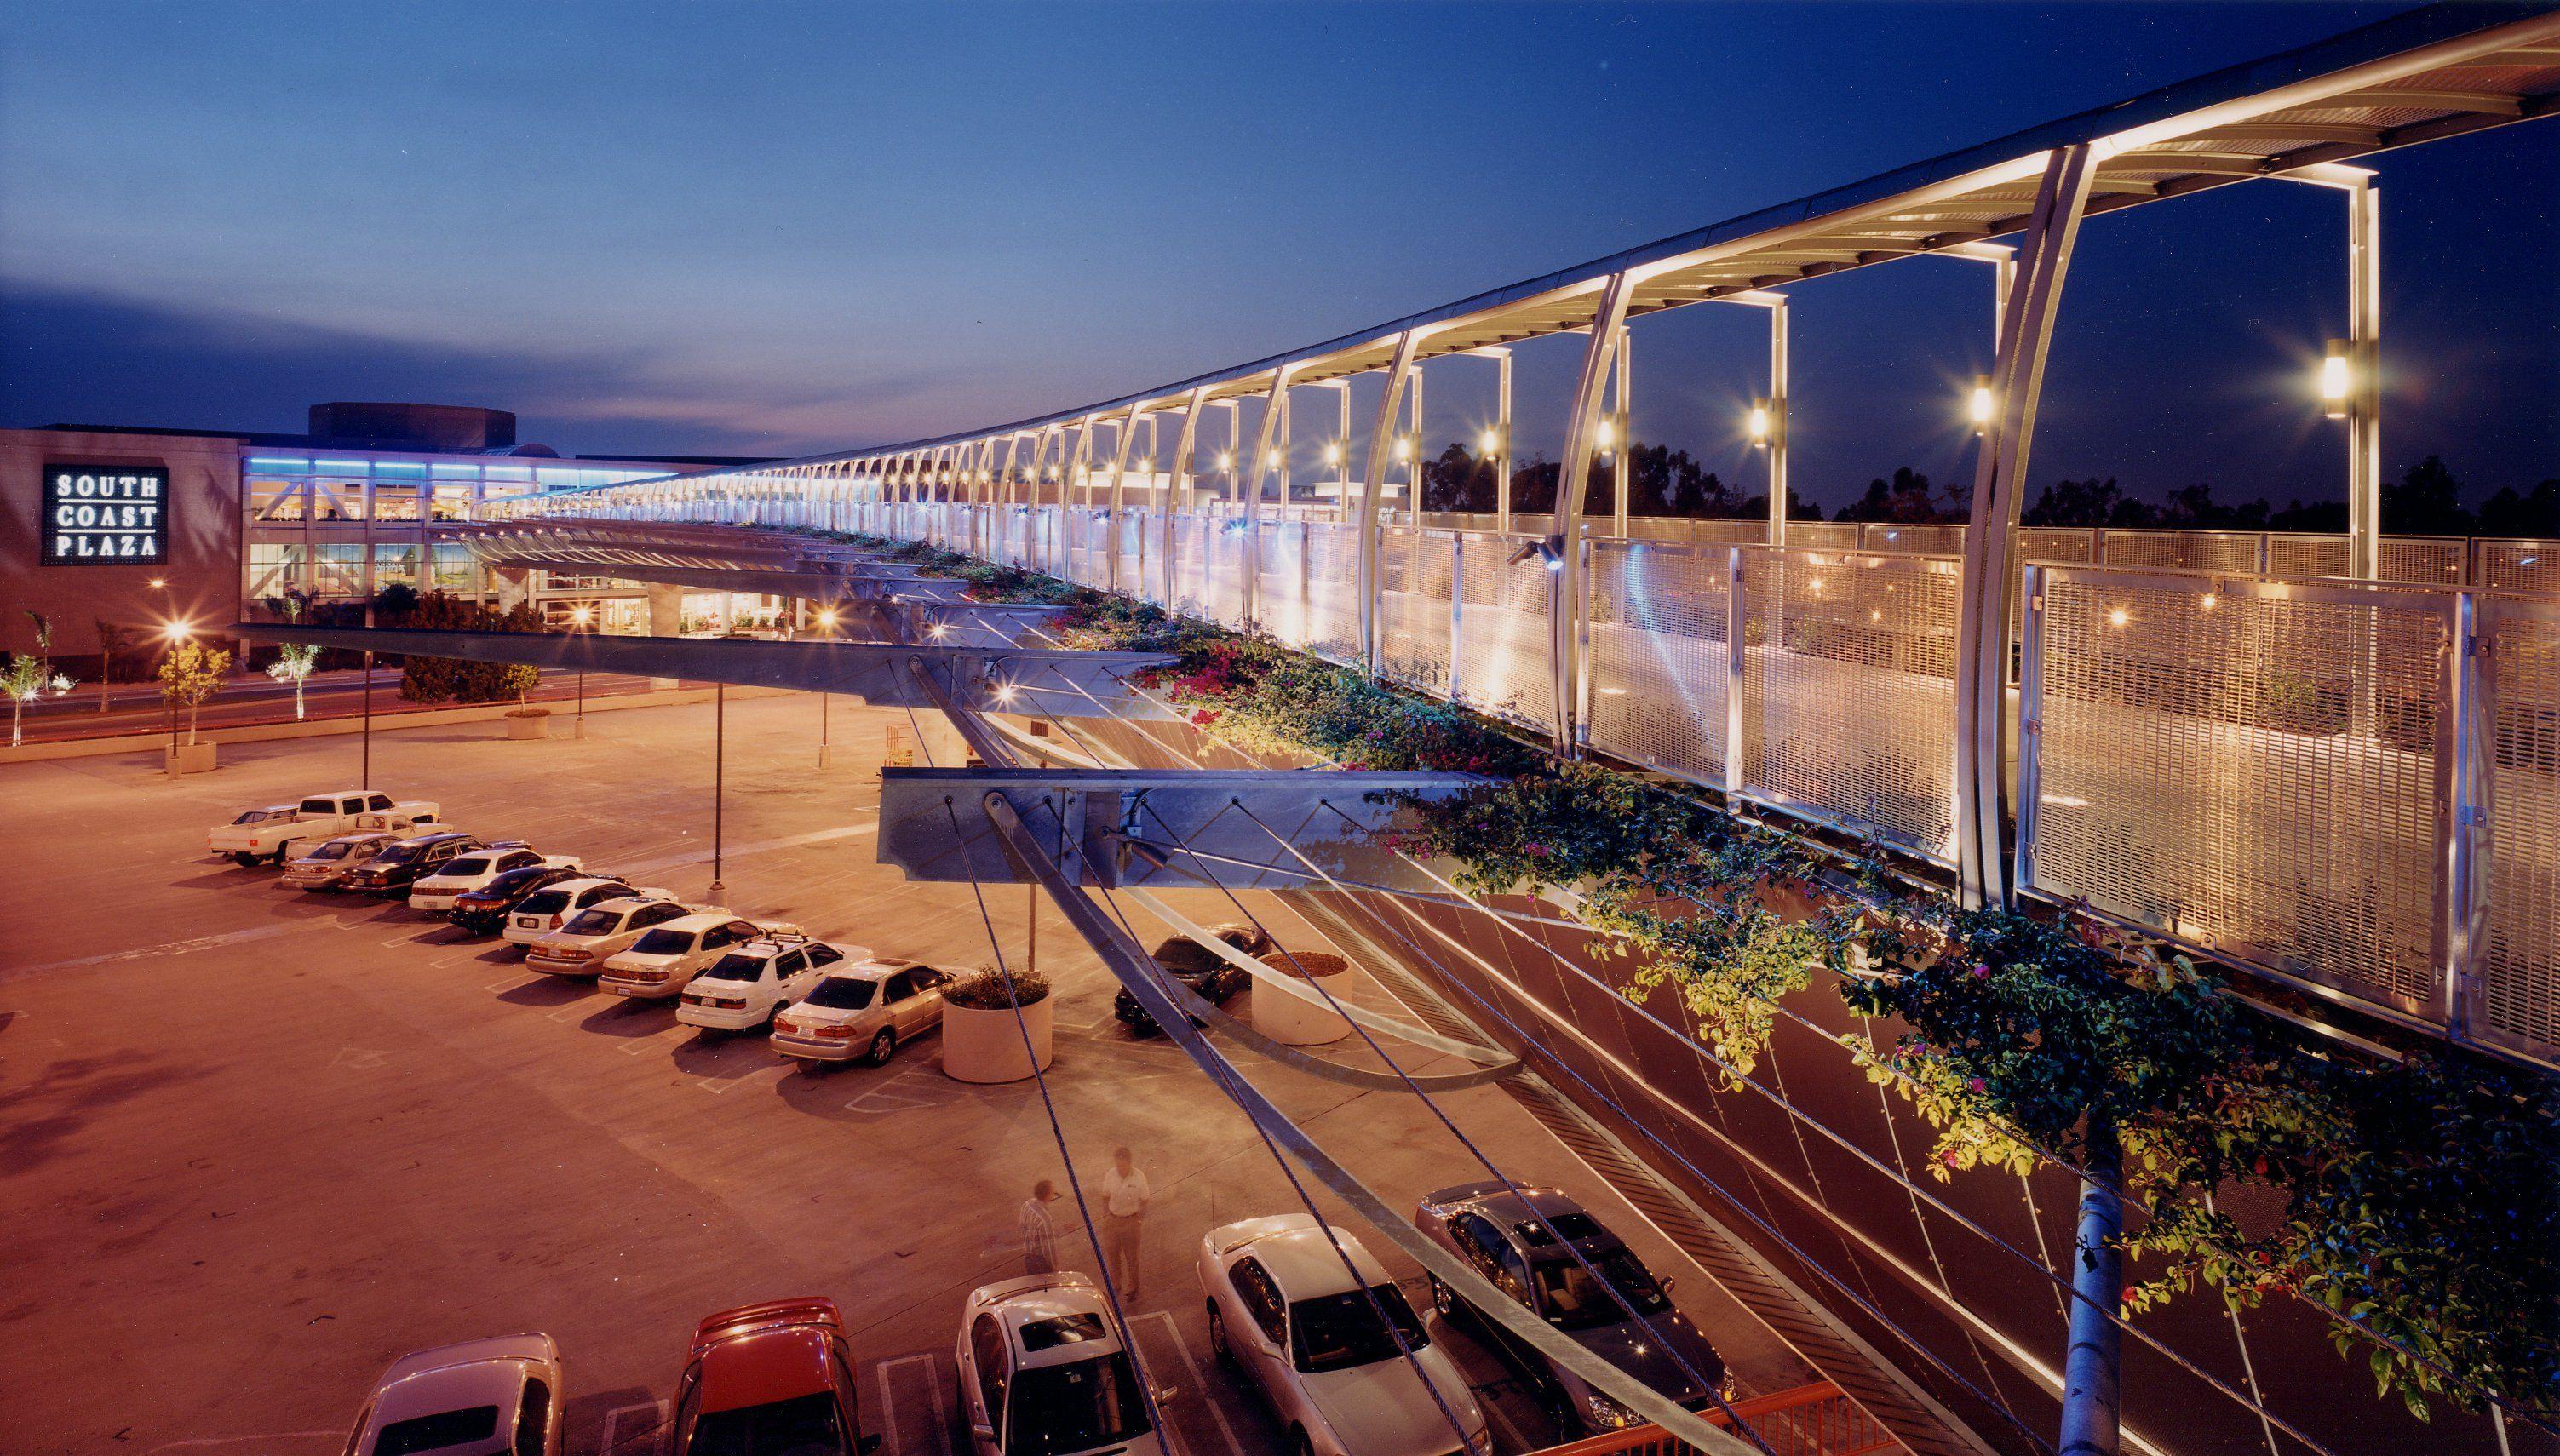 Bridge-South Coast Plaza